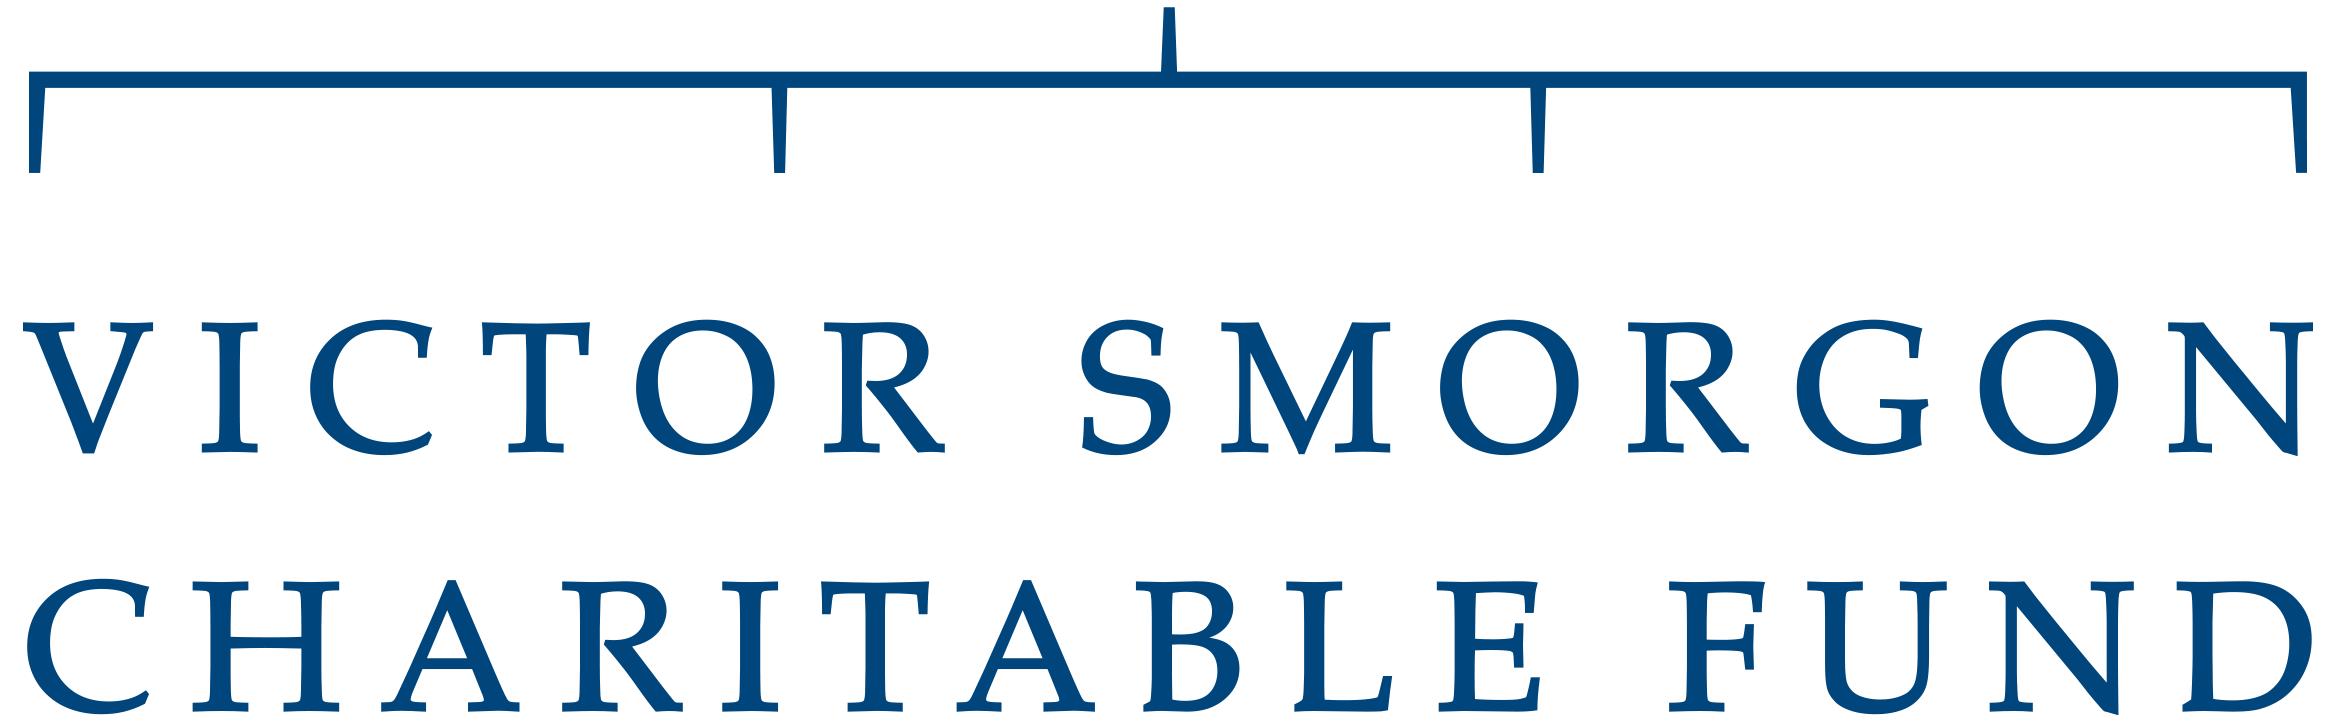 Victor Smorgon Charitable Fund logo